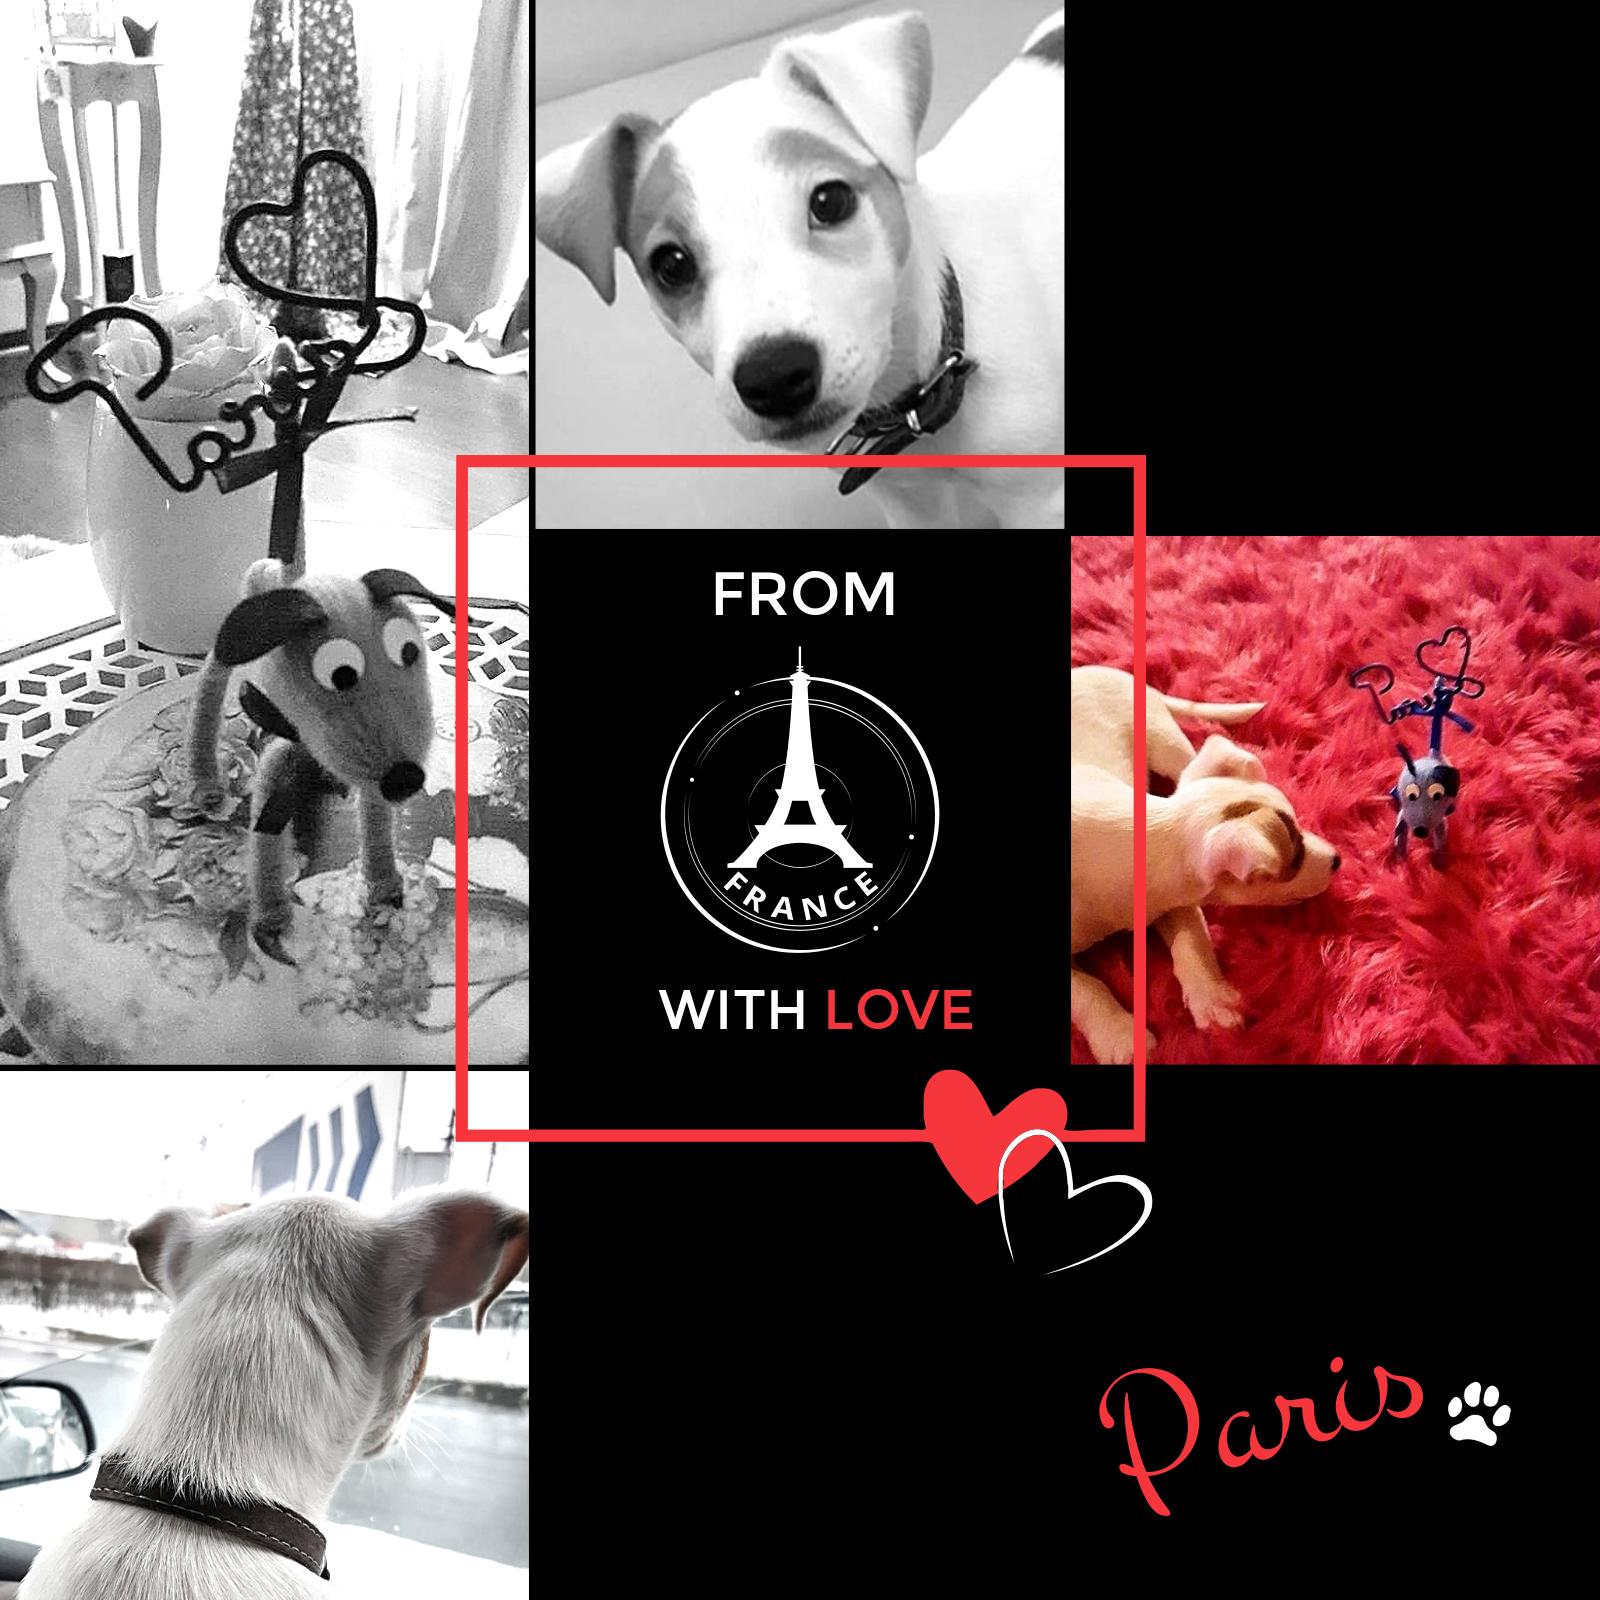 paris-with-love-12.jpg